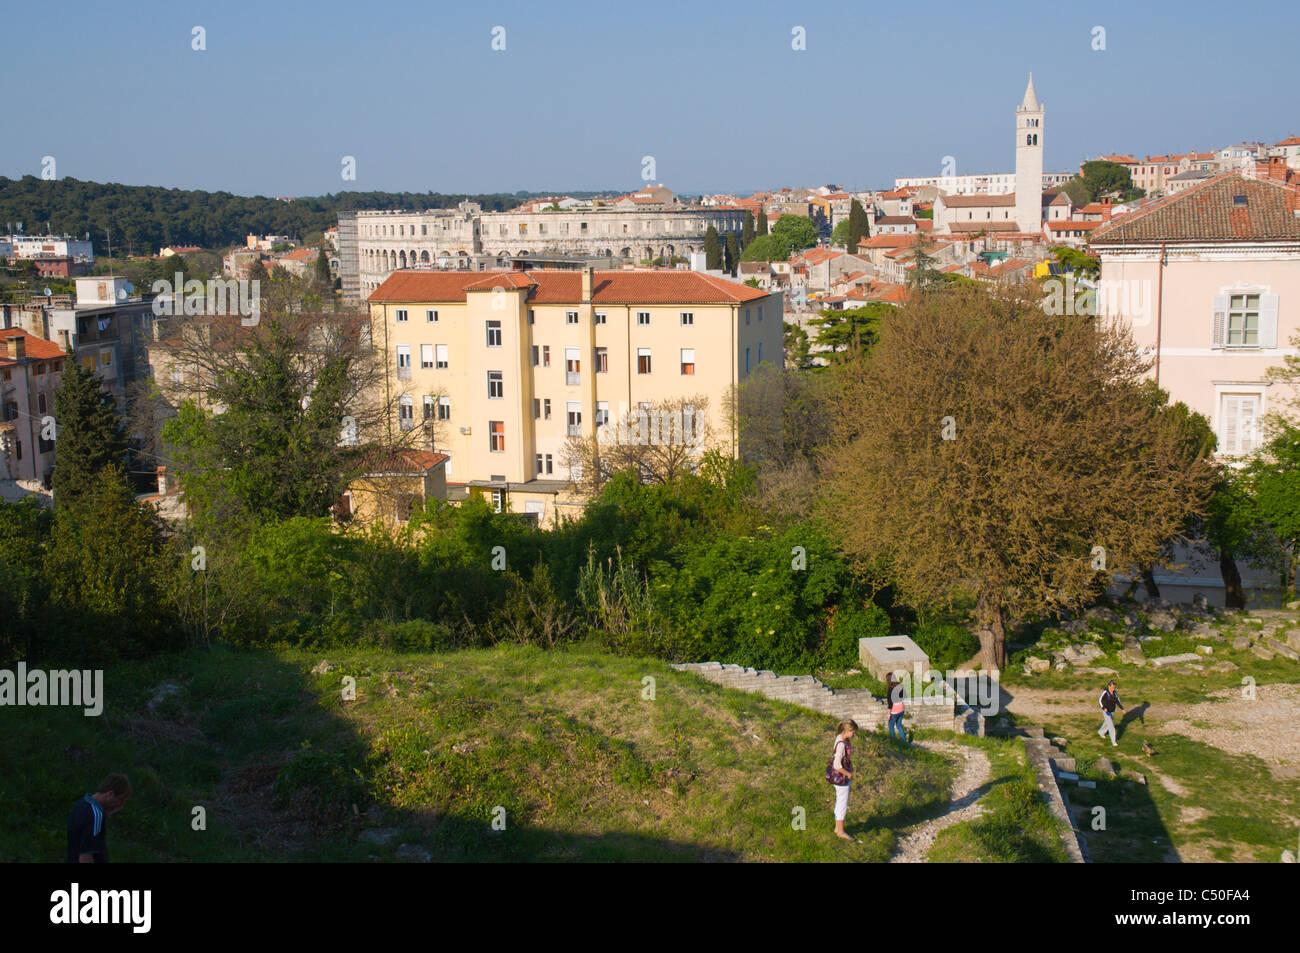 Malo Rimsko Kazaliste the small Roman Theatre on fortress hills Pula the Istrian peninsula Croatia Europe - Stock Image